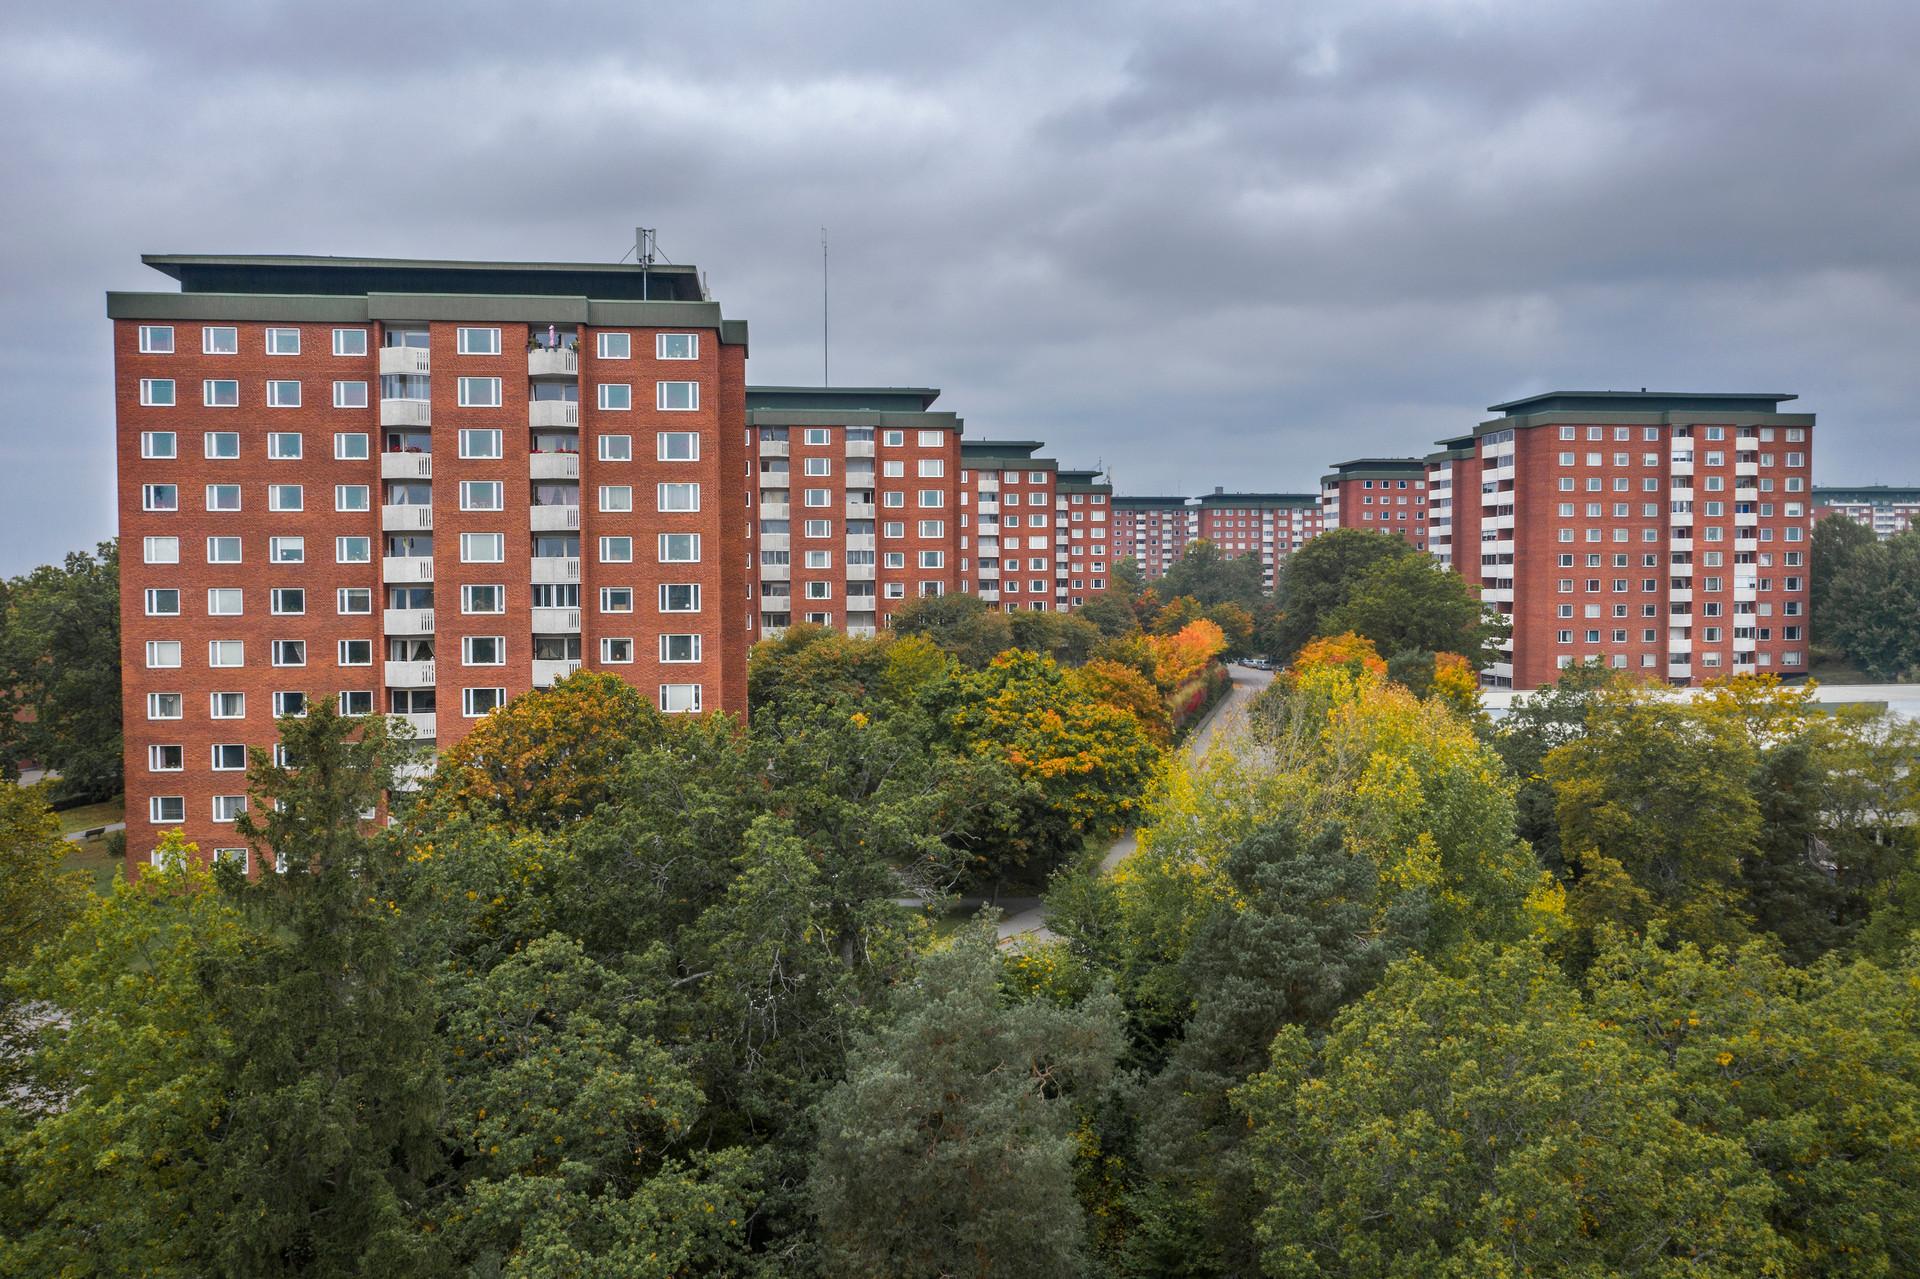 Larsberg (Lidingö)